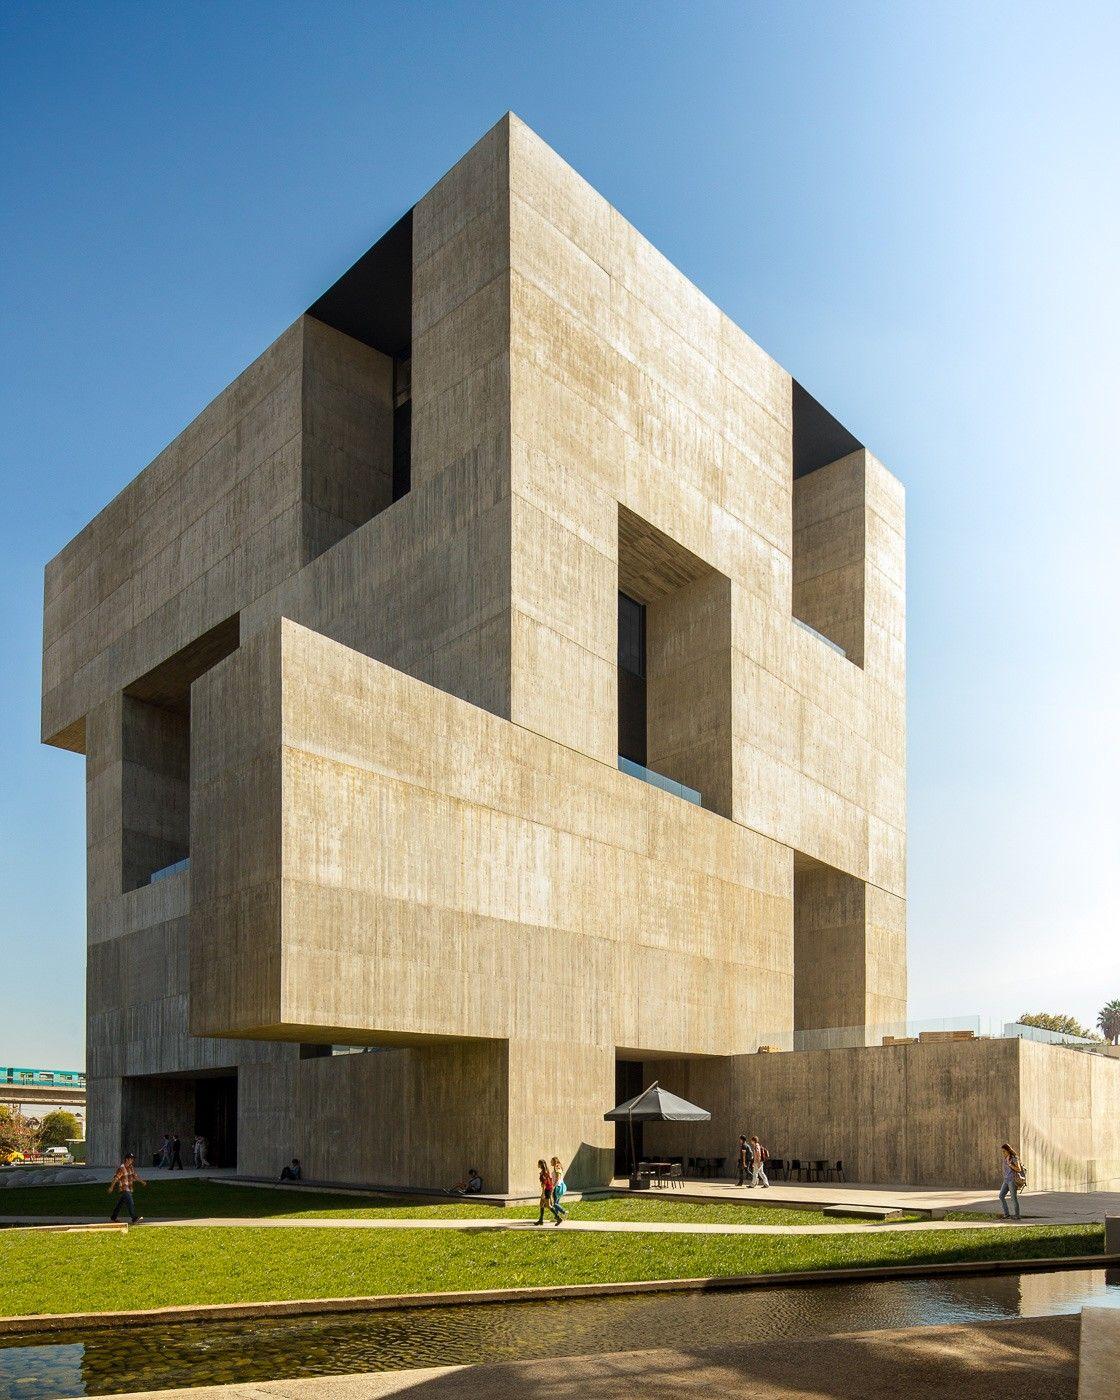 Centro de innovacion uc chile alejandro aravena anacleto for Alejandro aravena arquitecto